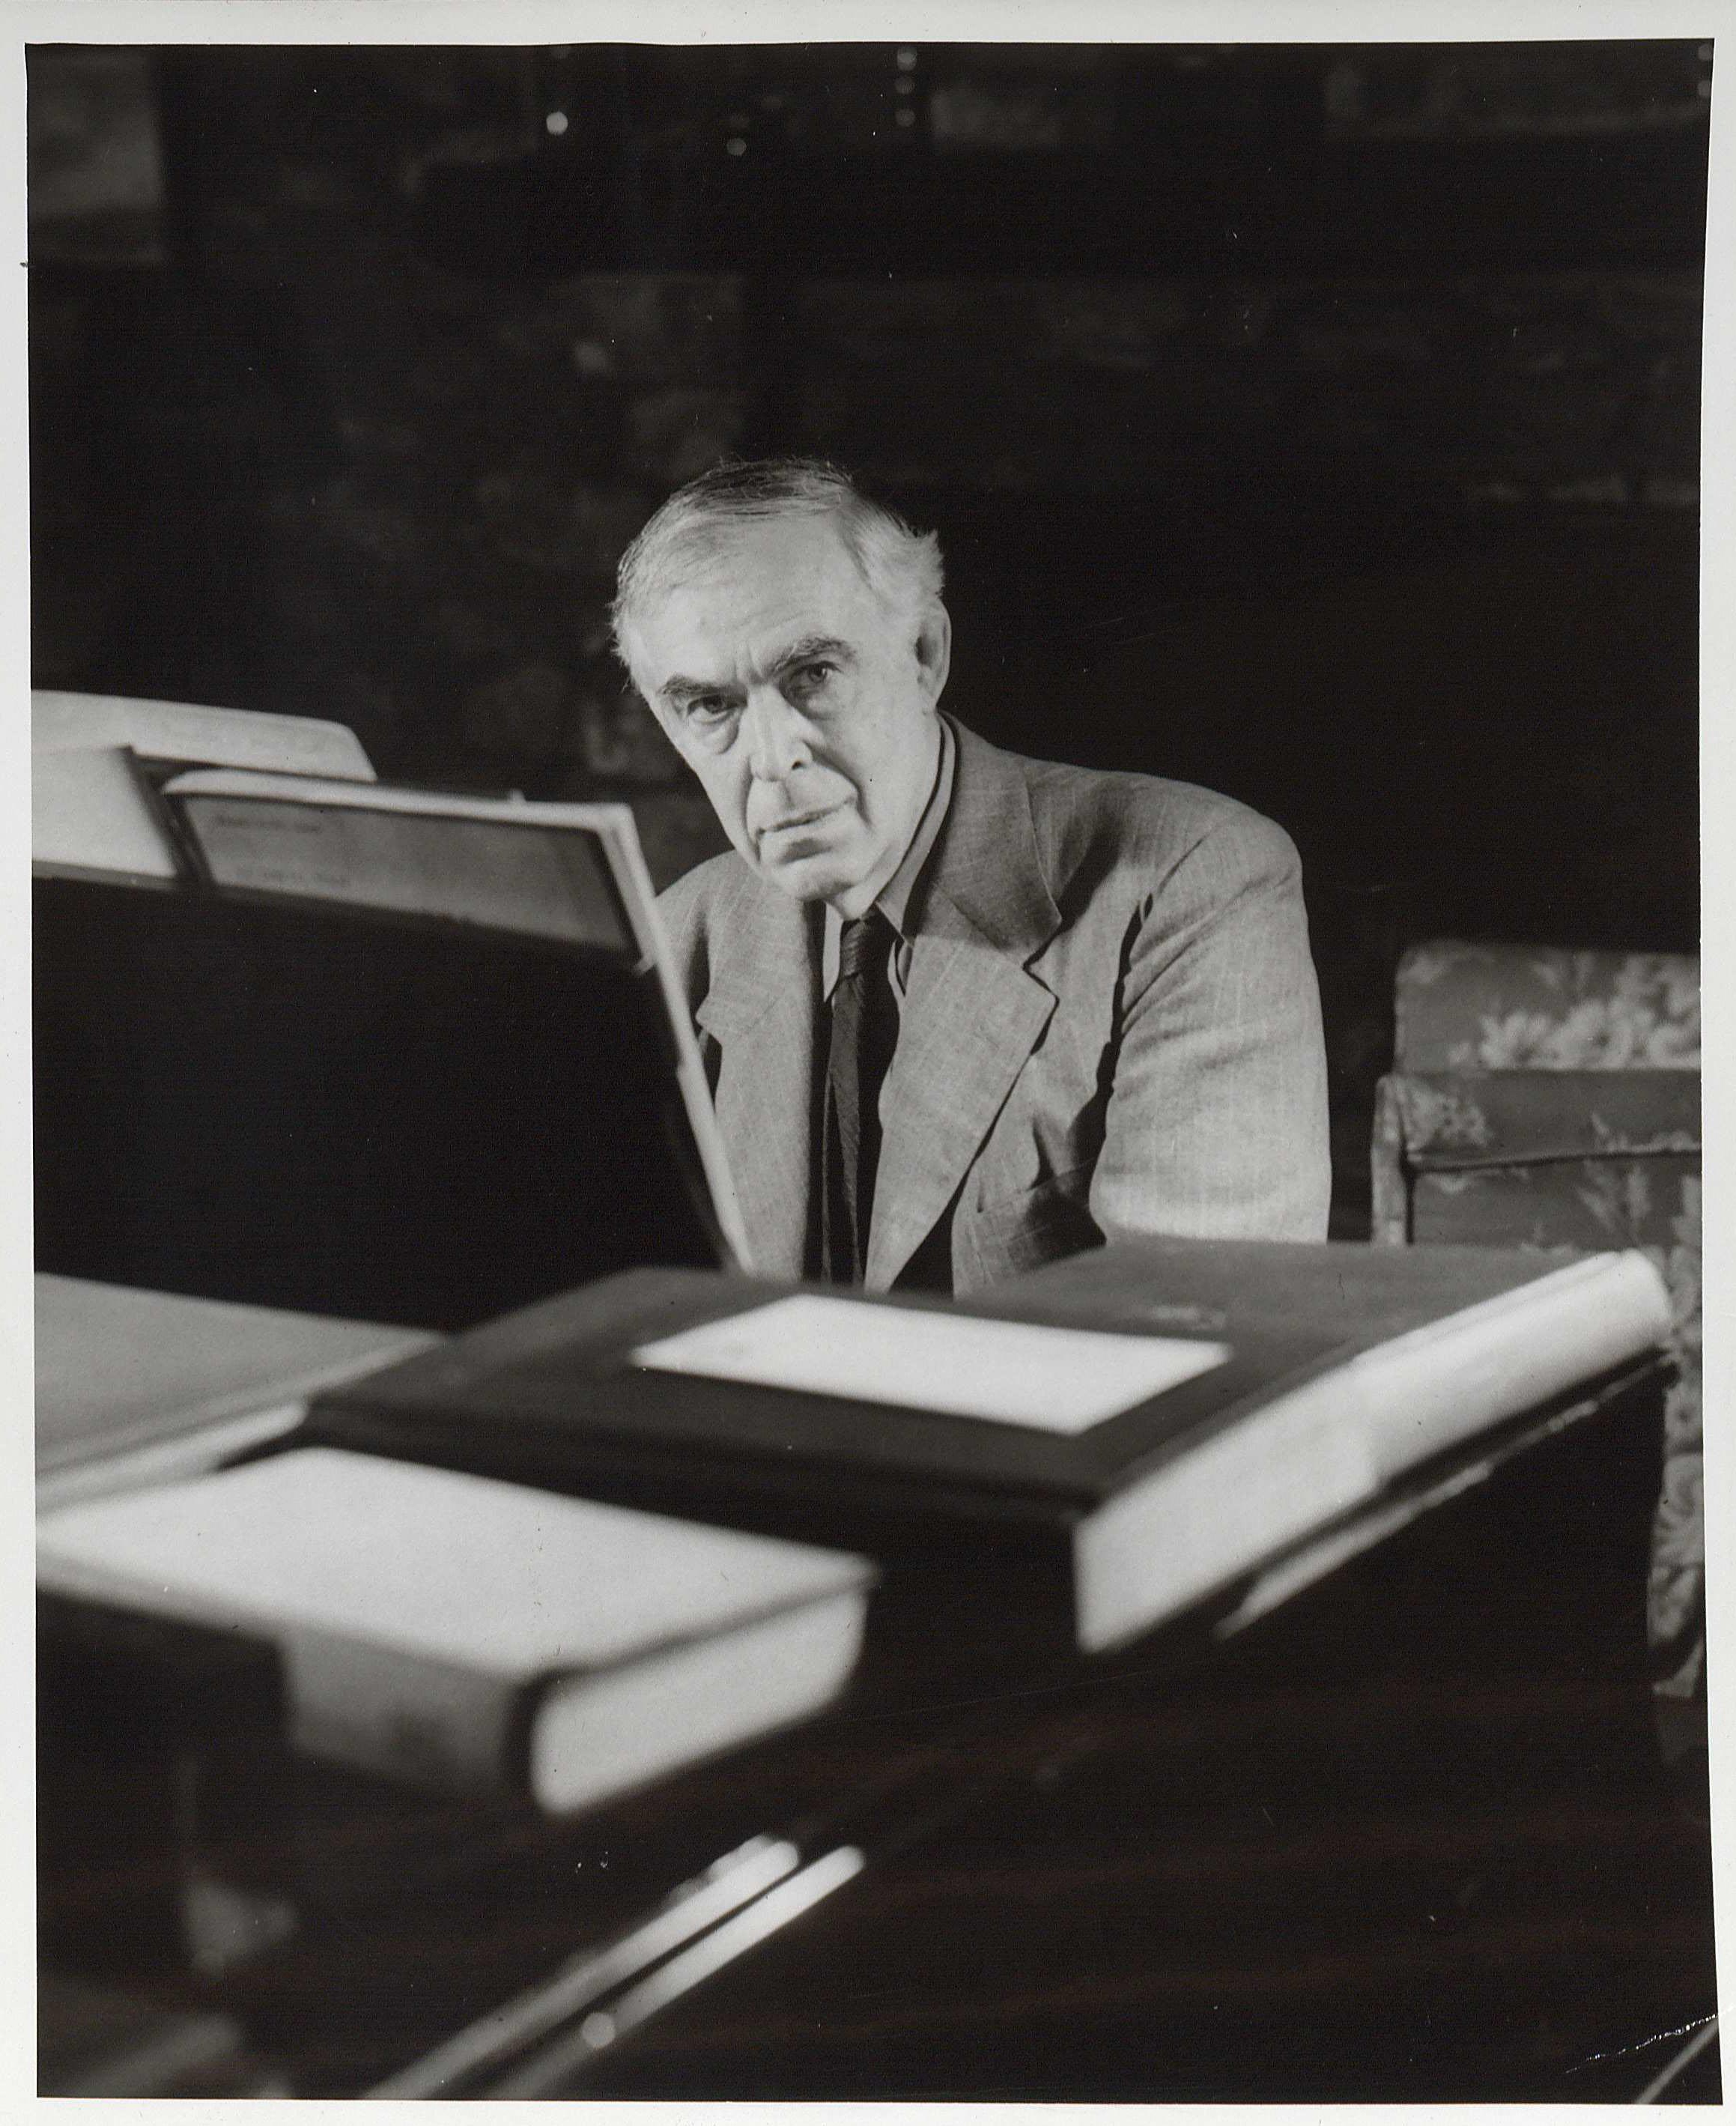 Portrait of John Powell, undated. (Image by Caroline Newcomb)